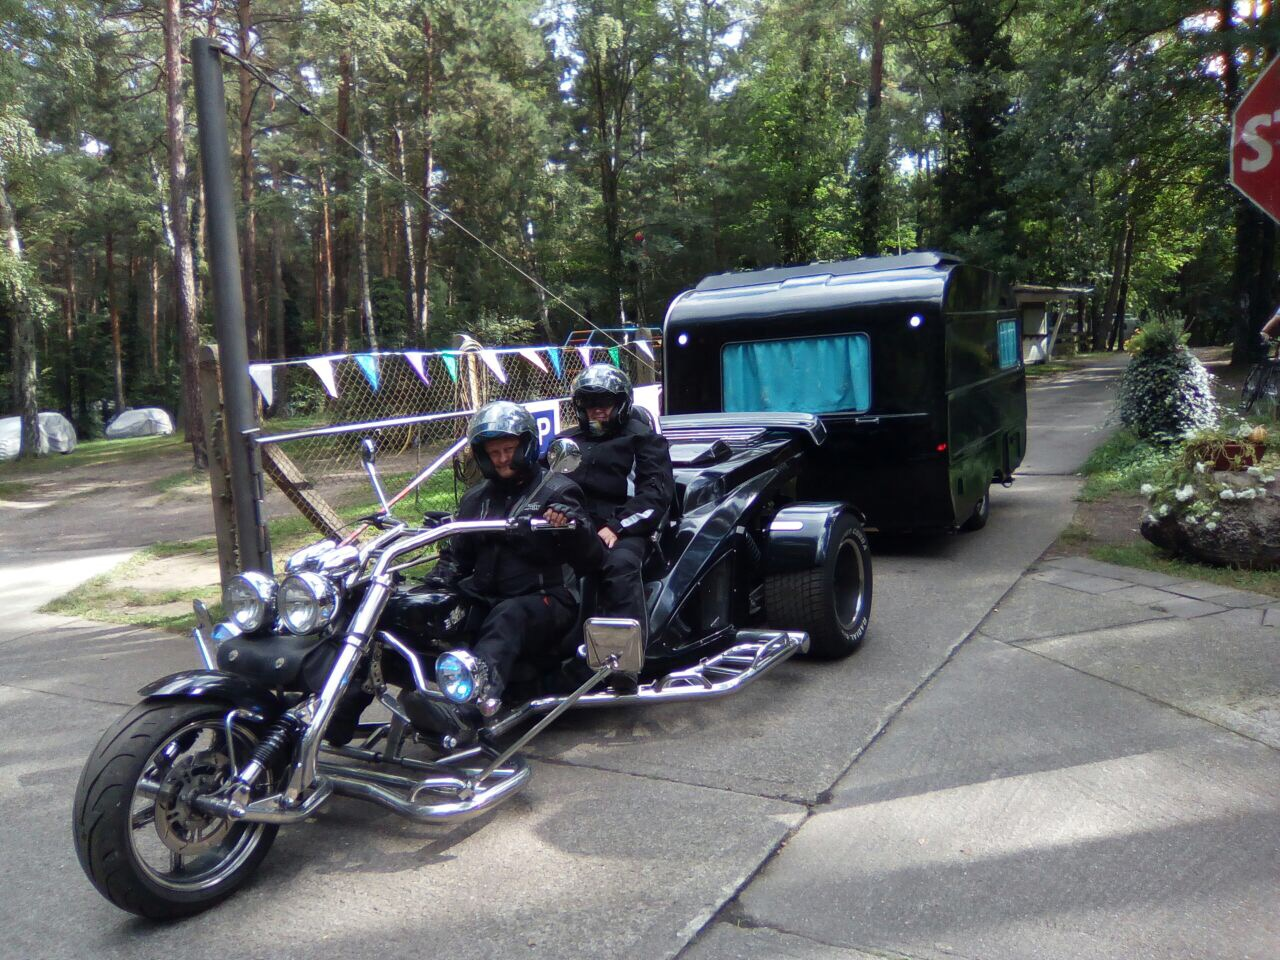 Trike_Campinganhaenger_Natur_Campingplatz